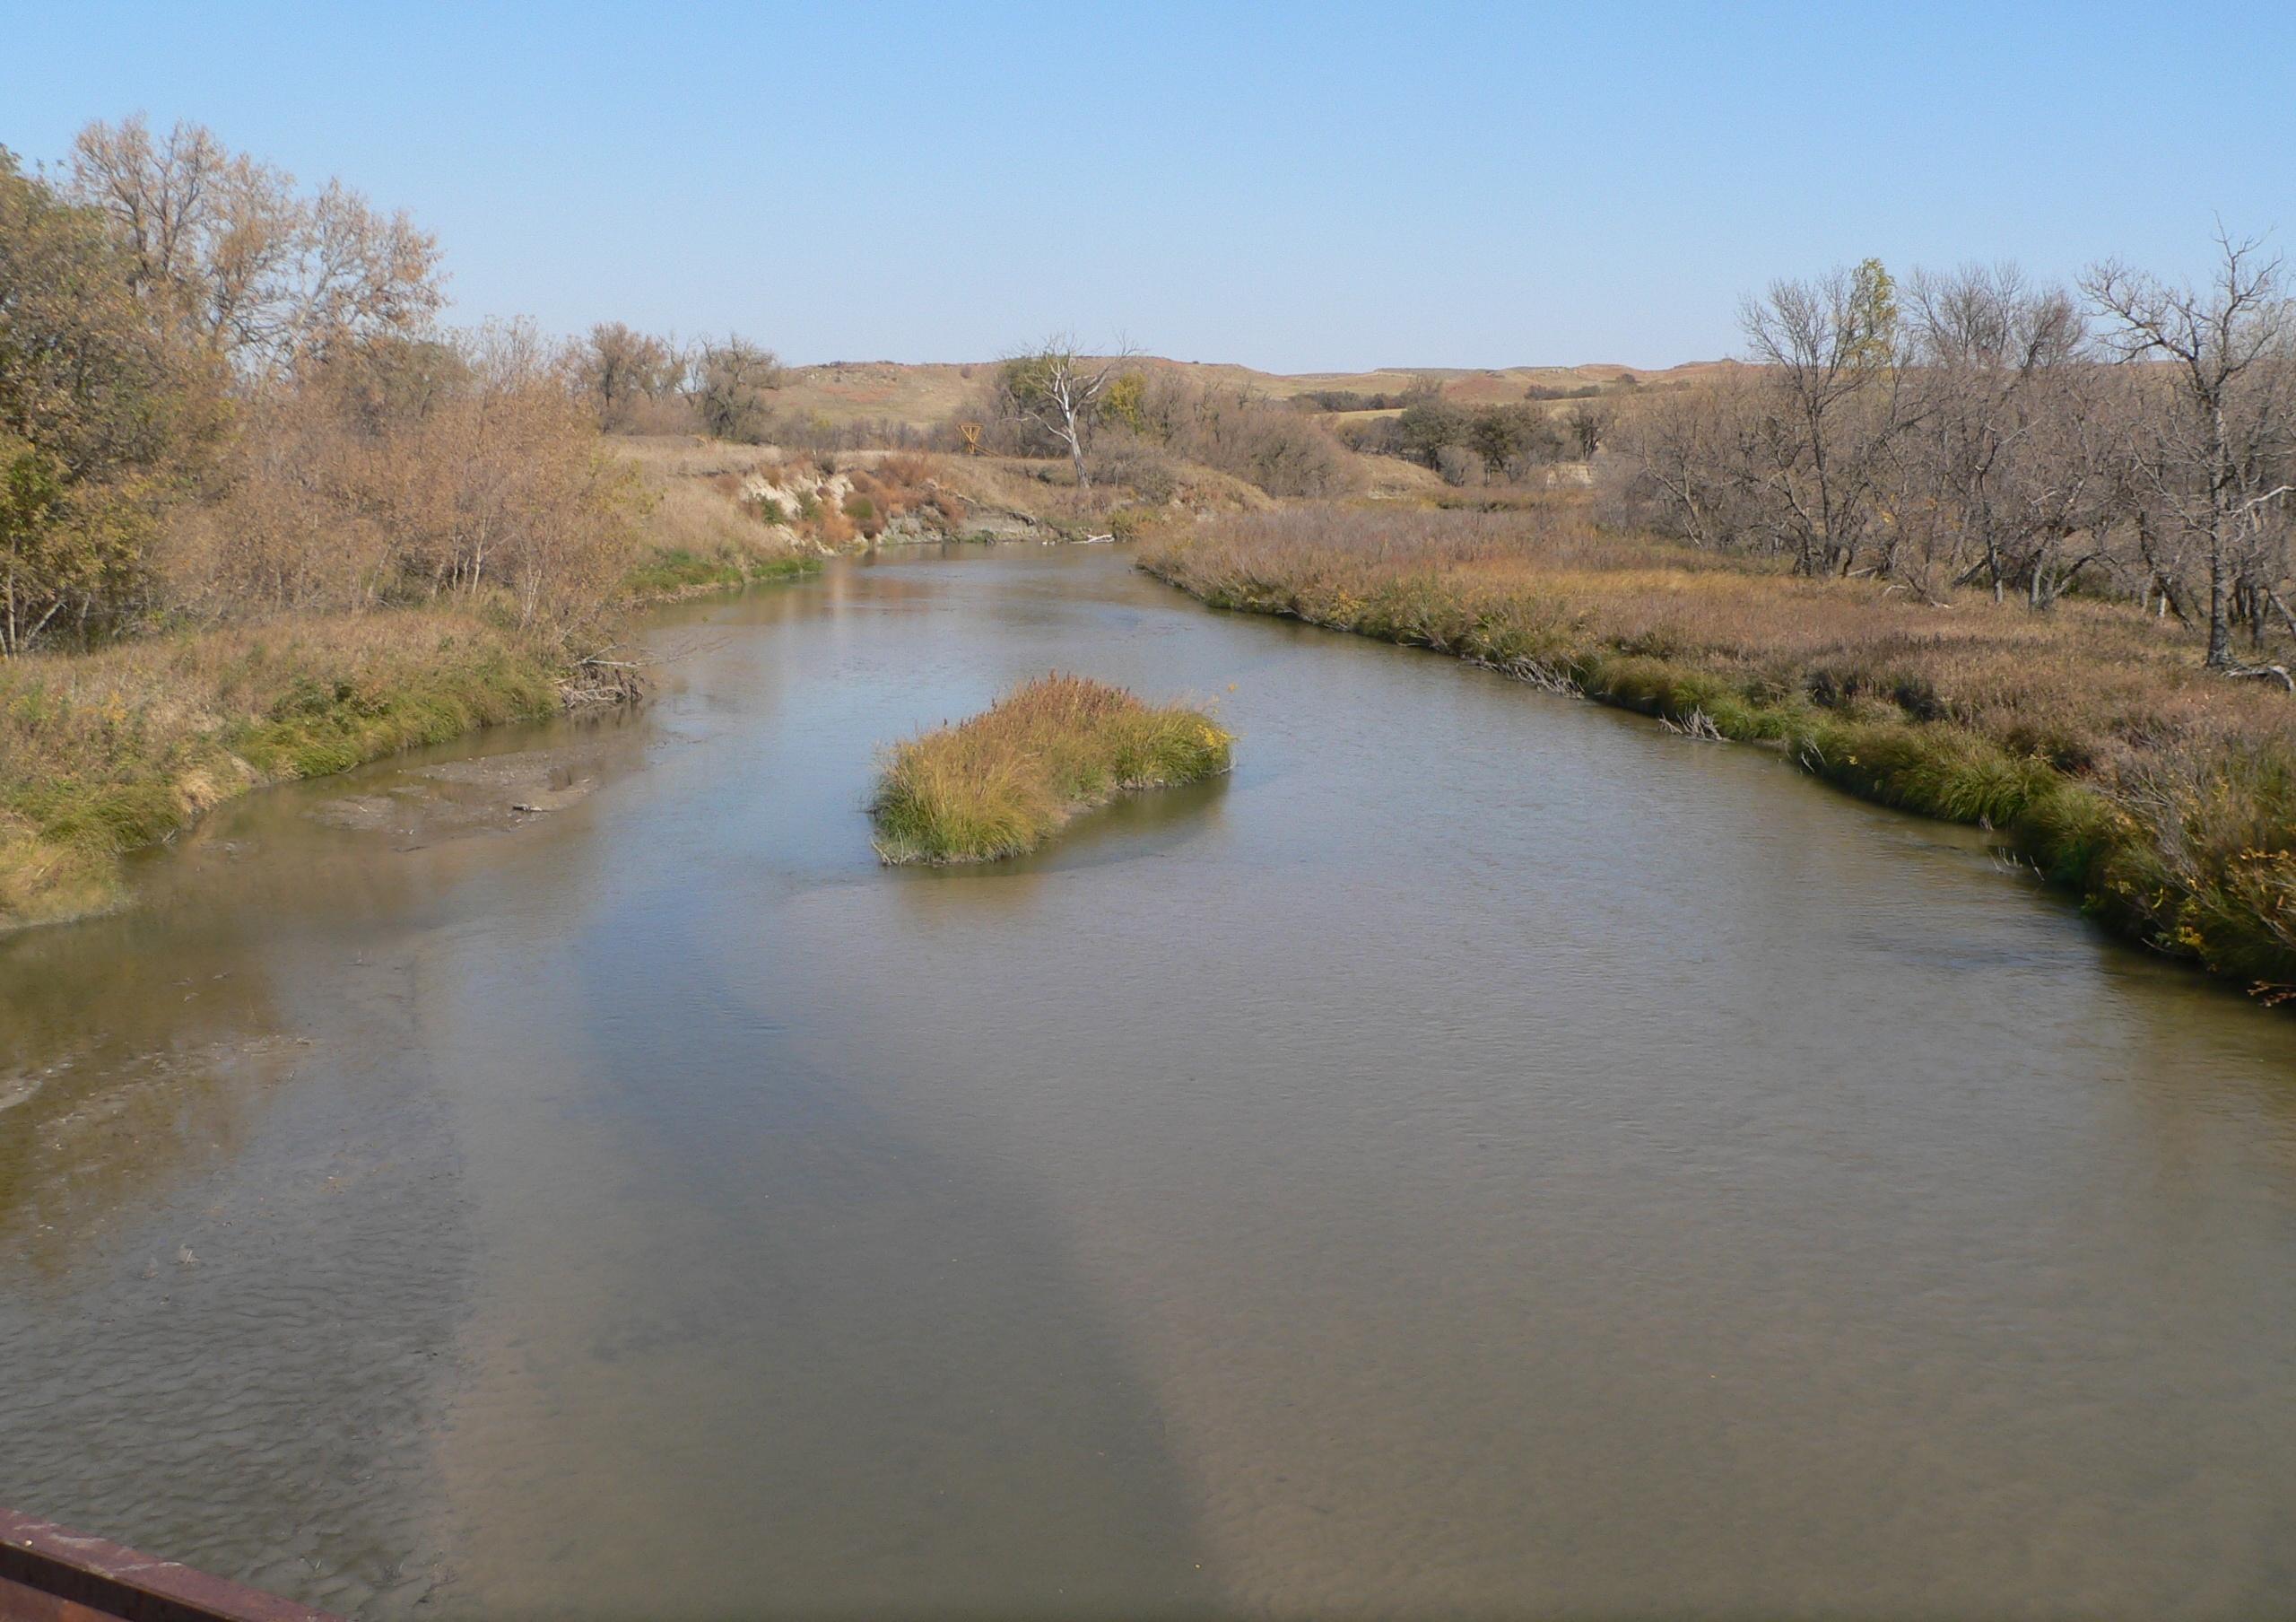 Description Keya Paha River from Lewis Bridge DS.JPG